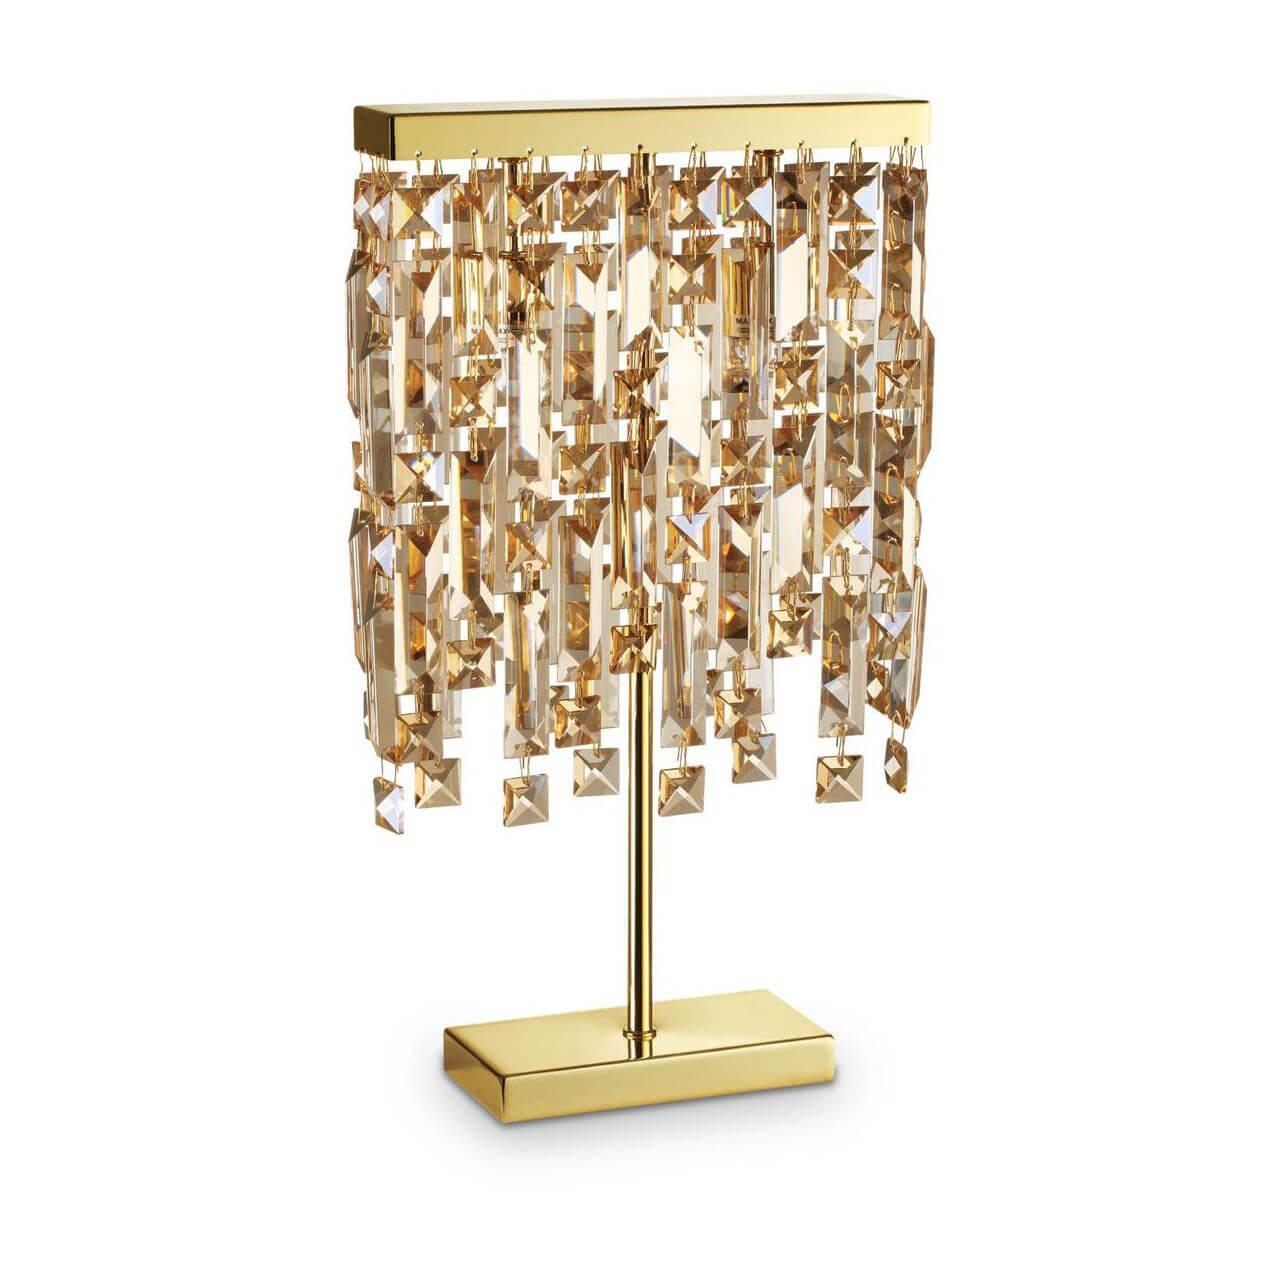 Настольная лампа Ideal Lux Elisir TL2 Ottone недорого